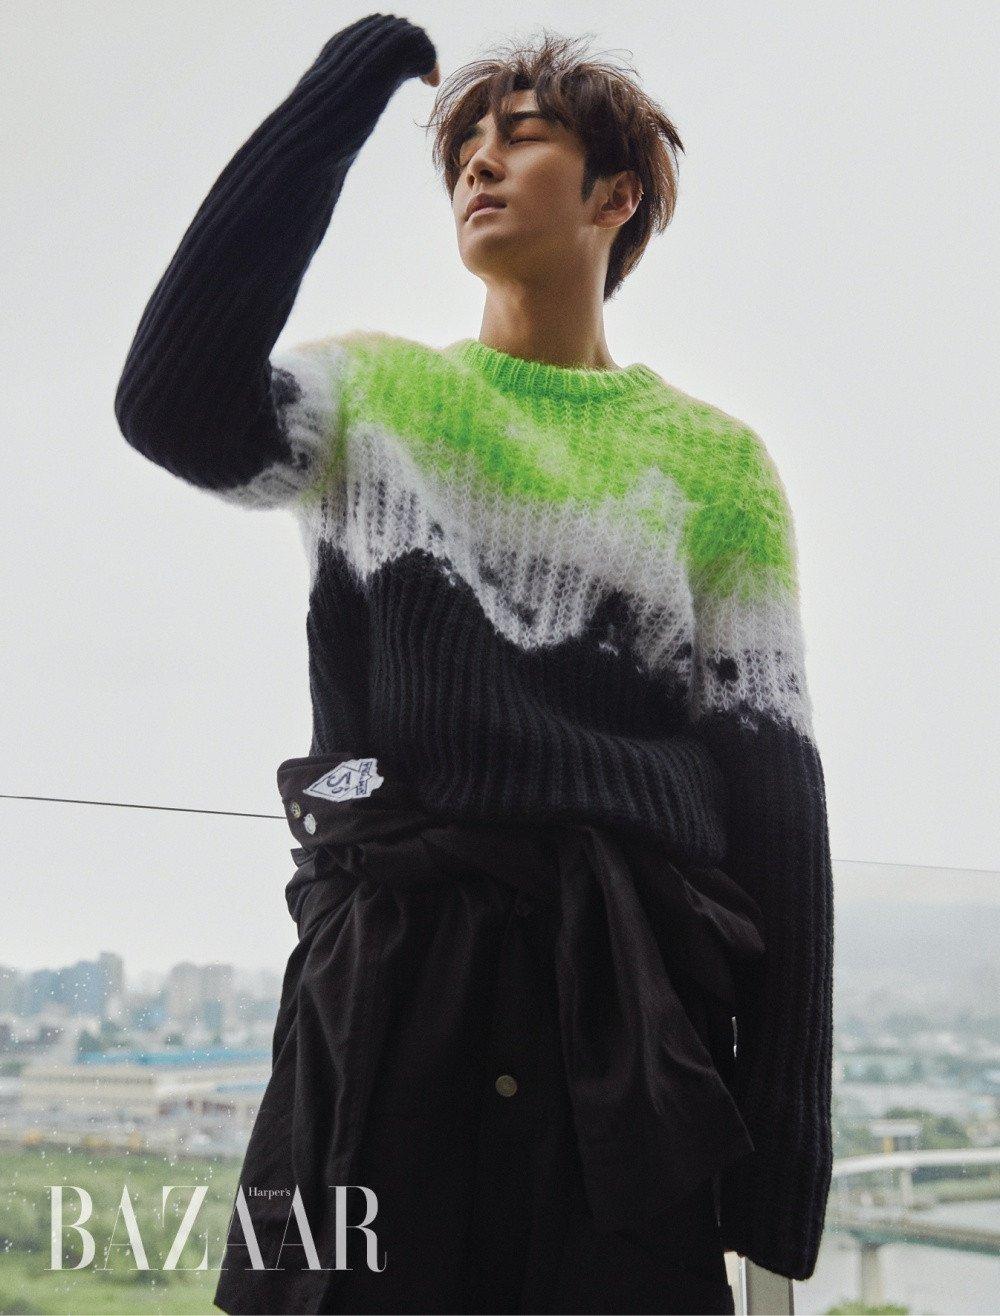 nuest-baekho-trendy-side-harper-bazaar-solo-pictorial-2